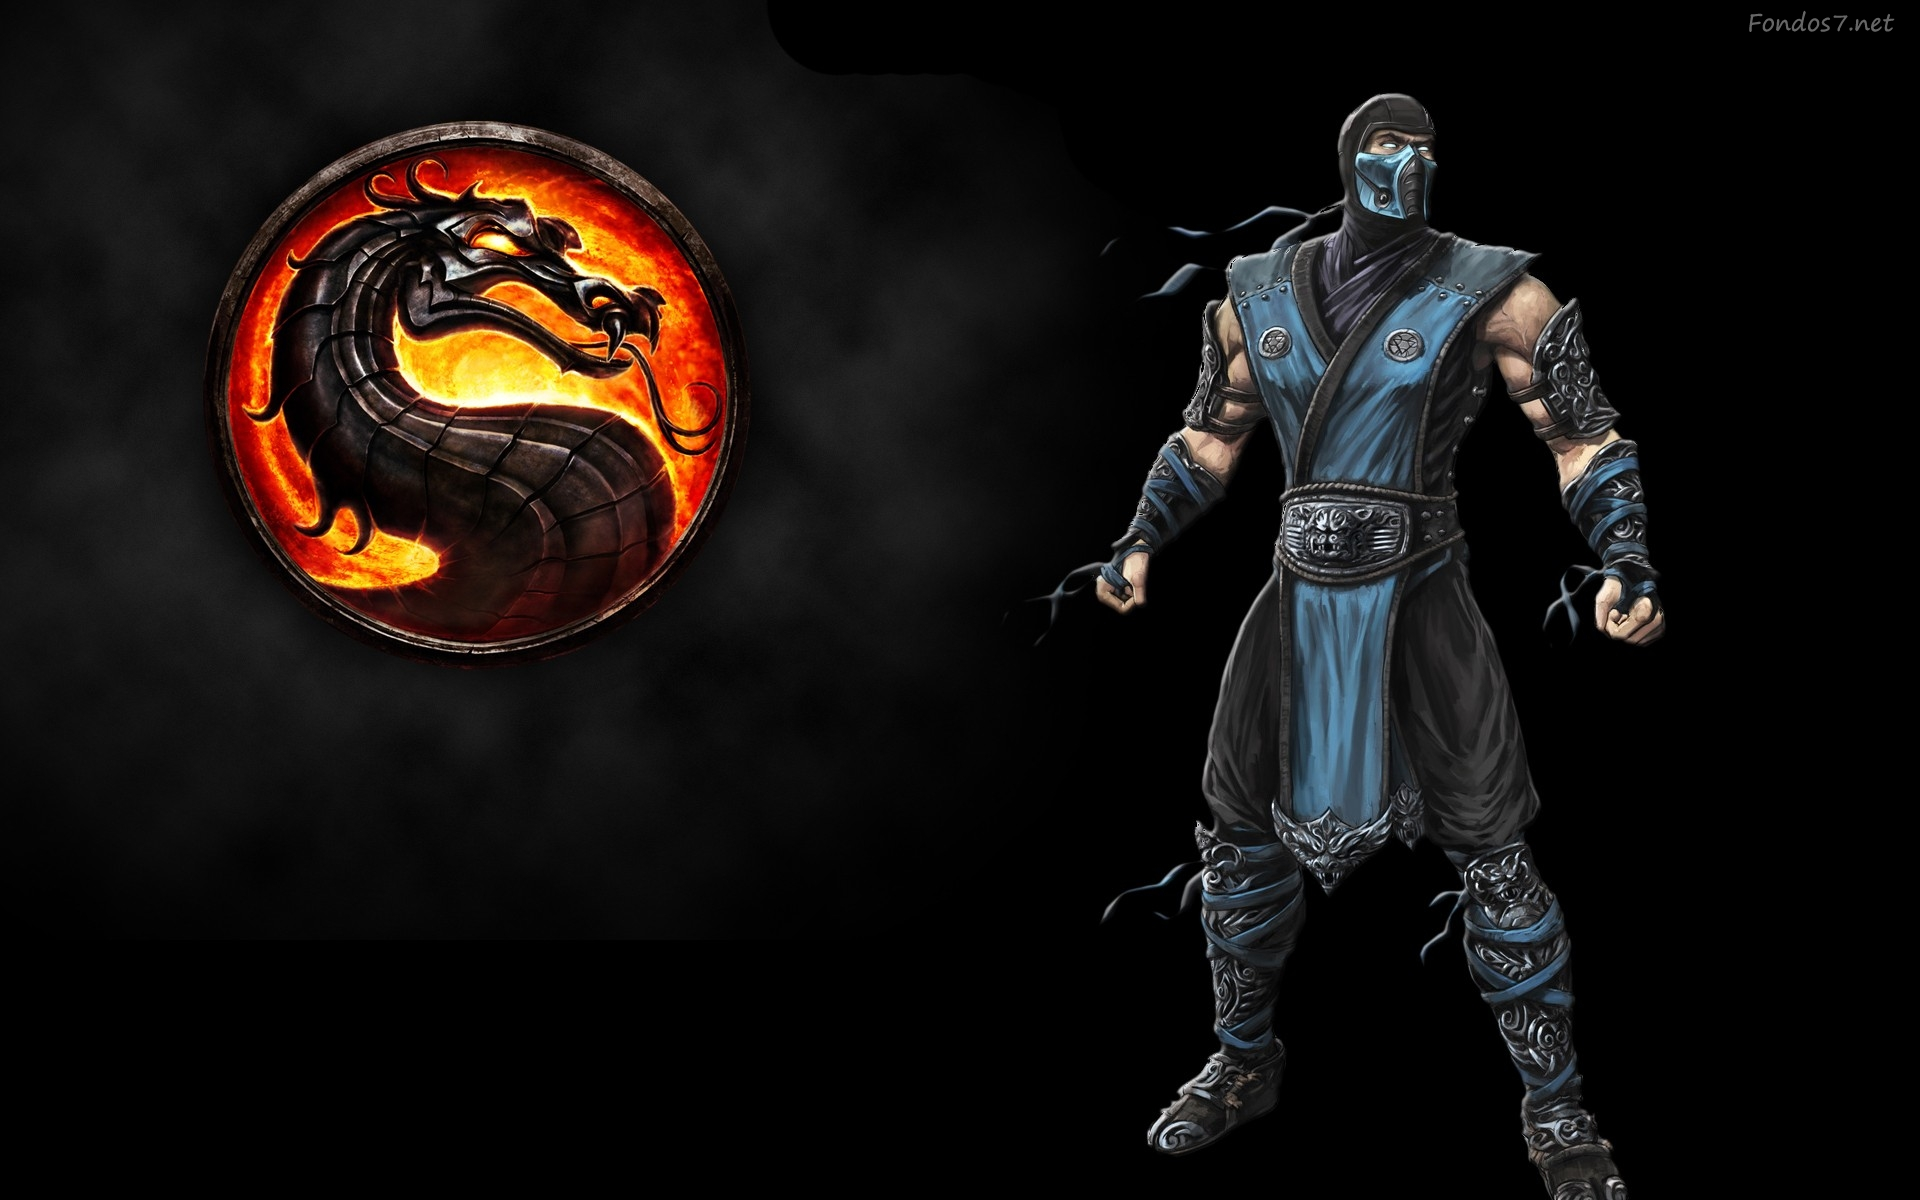 Sub Zero in Mortal Kombat Exclusive HD Wallpapers 4084 1920x1200